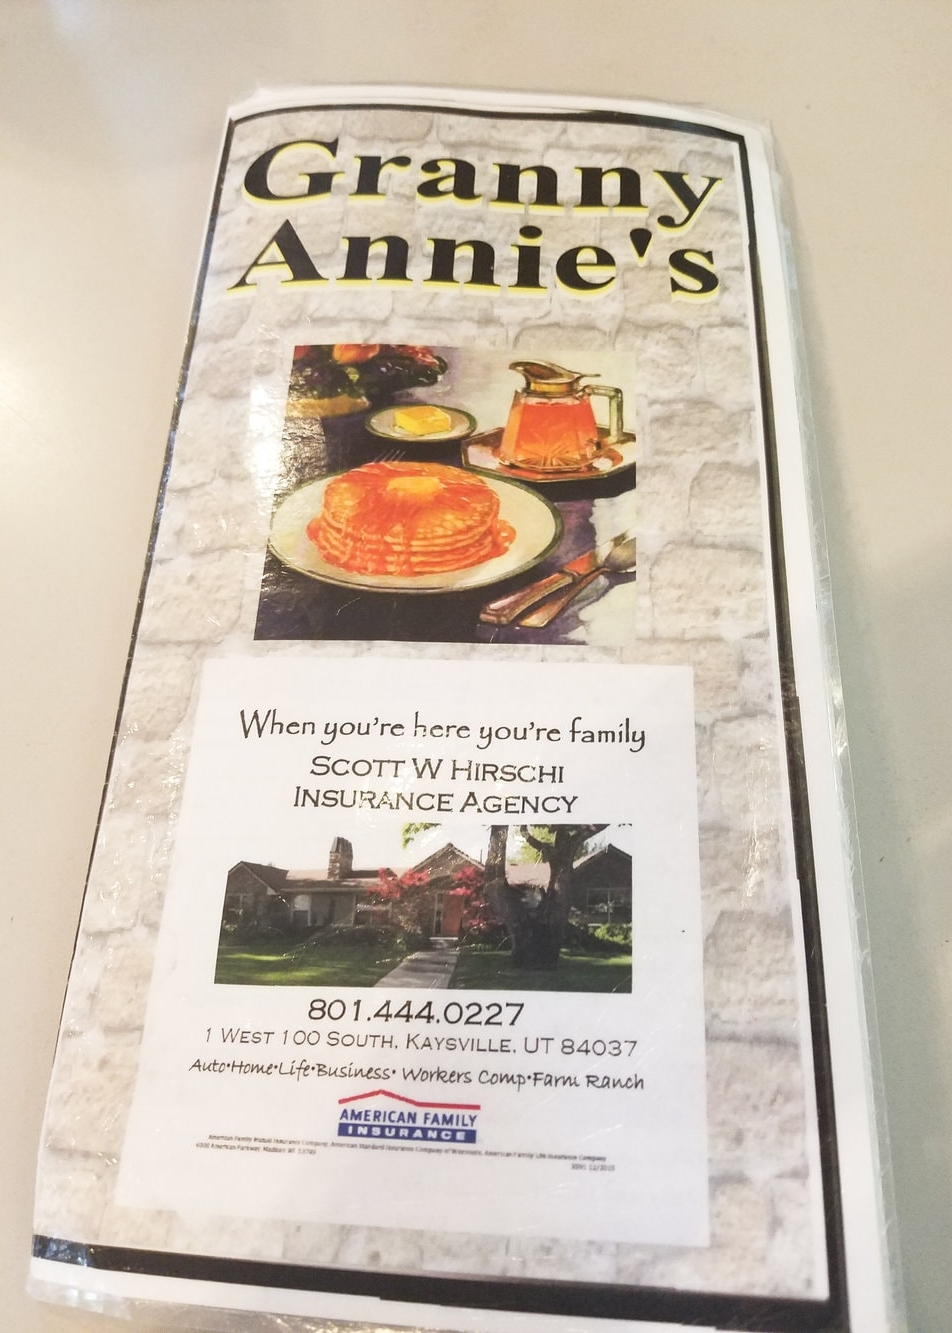 Granny Annie's Family Restaurant - Kaysville Utah - Brunch Date